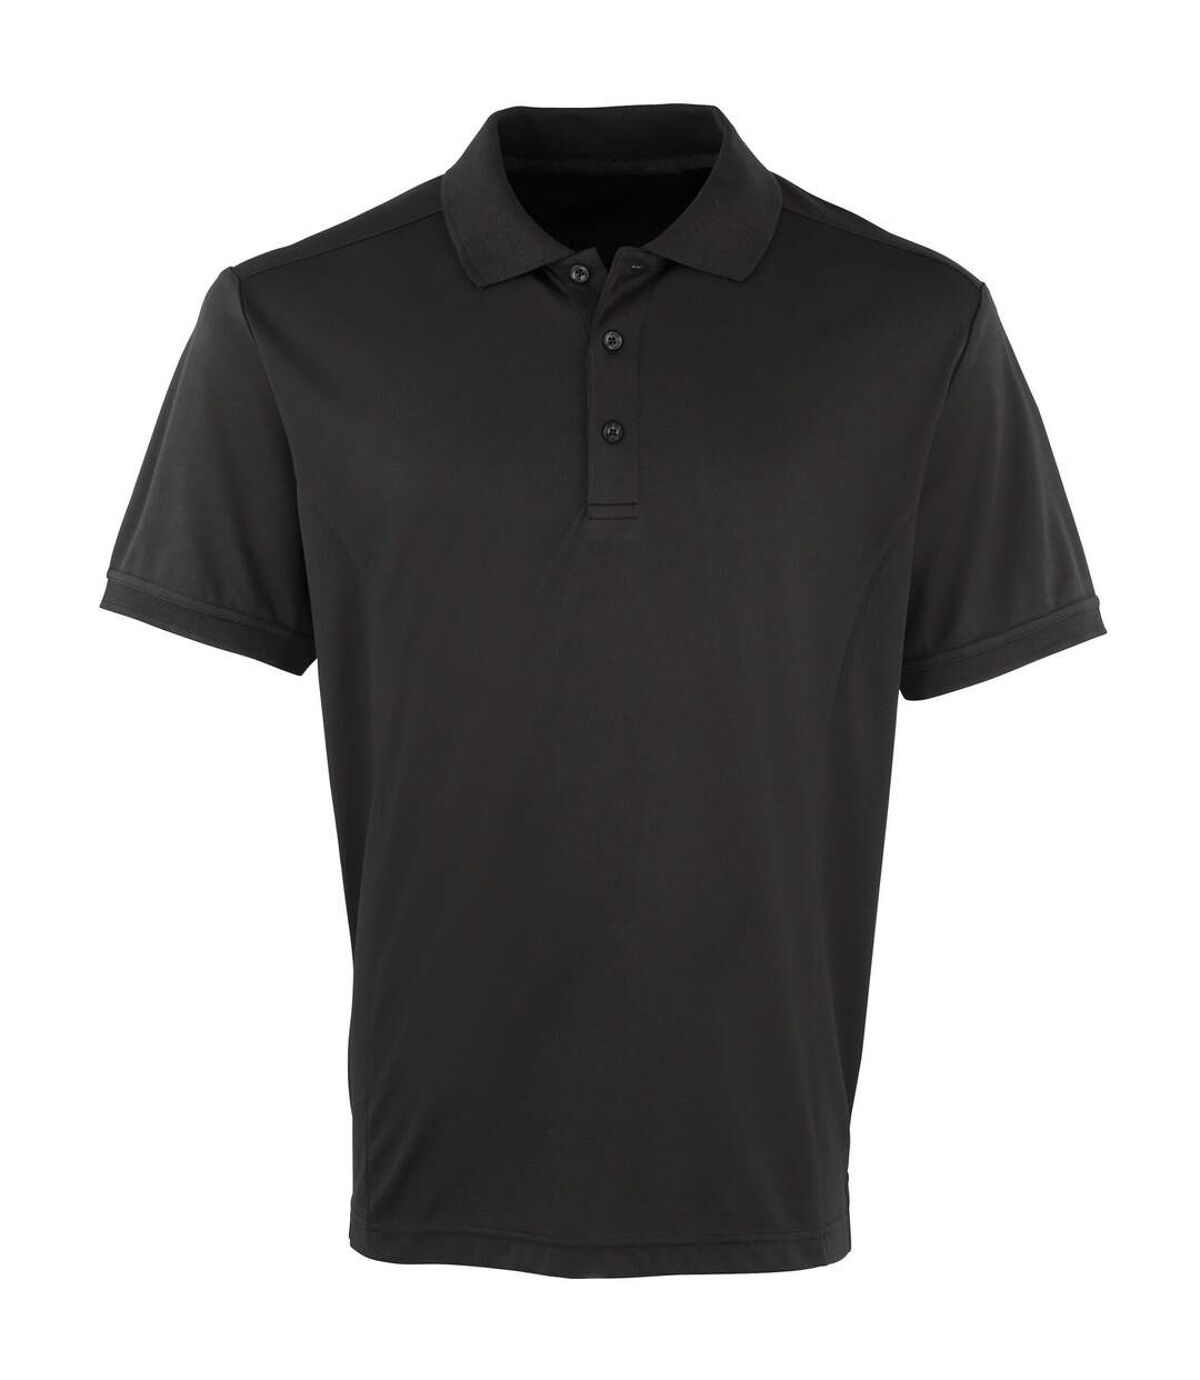 Premier Mens Coolchecker Pique Short Sleeve Polo T-Shirt (Bottle) - UTRW4401